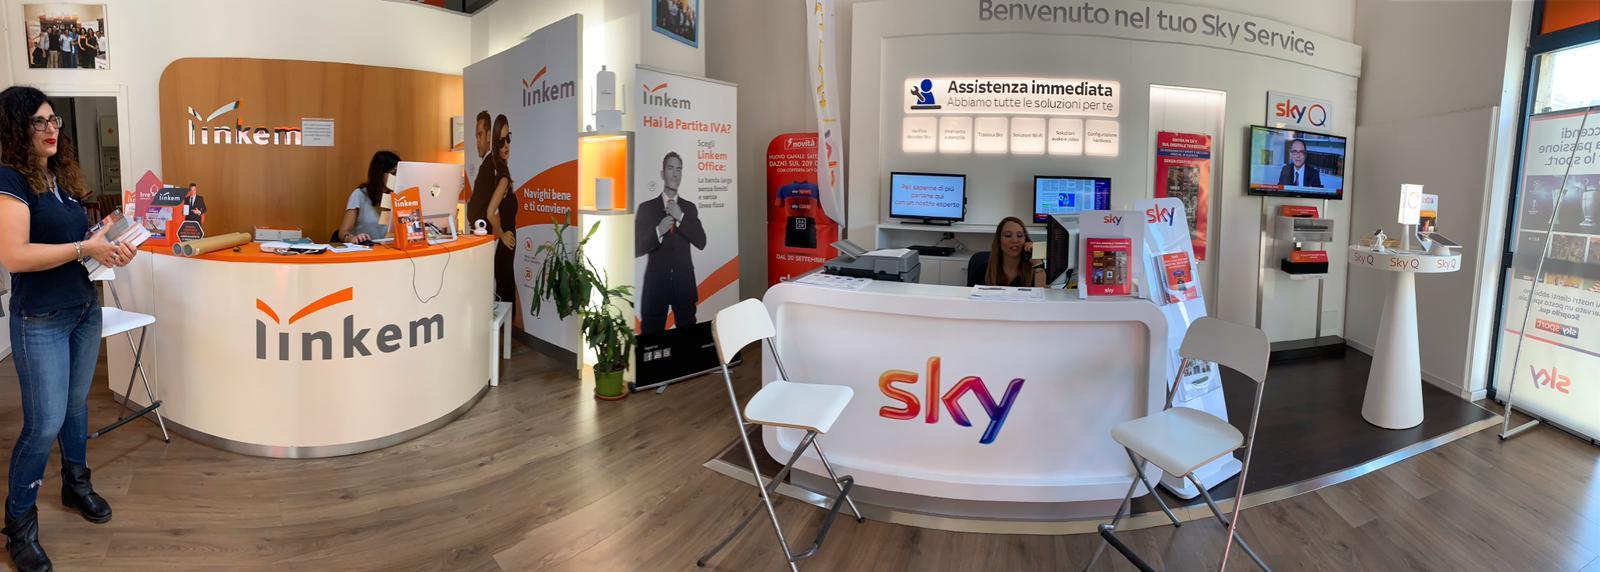 Internet senza fili a Catania